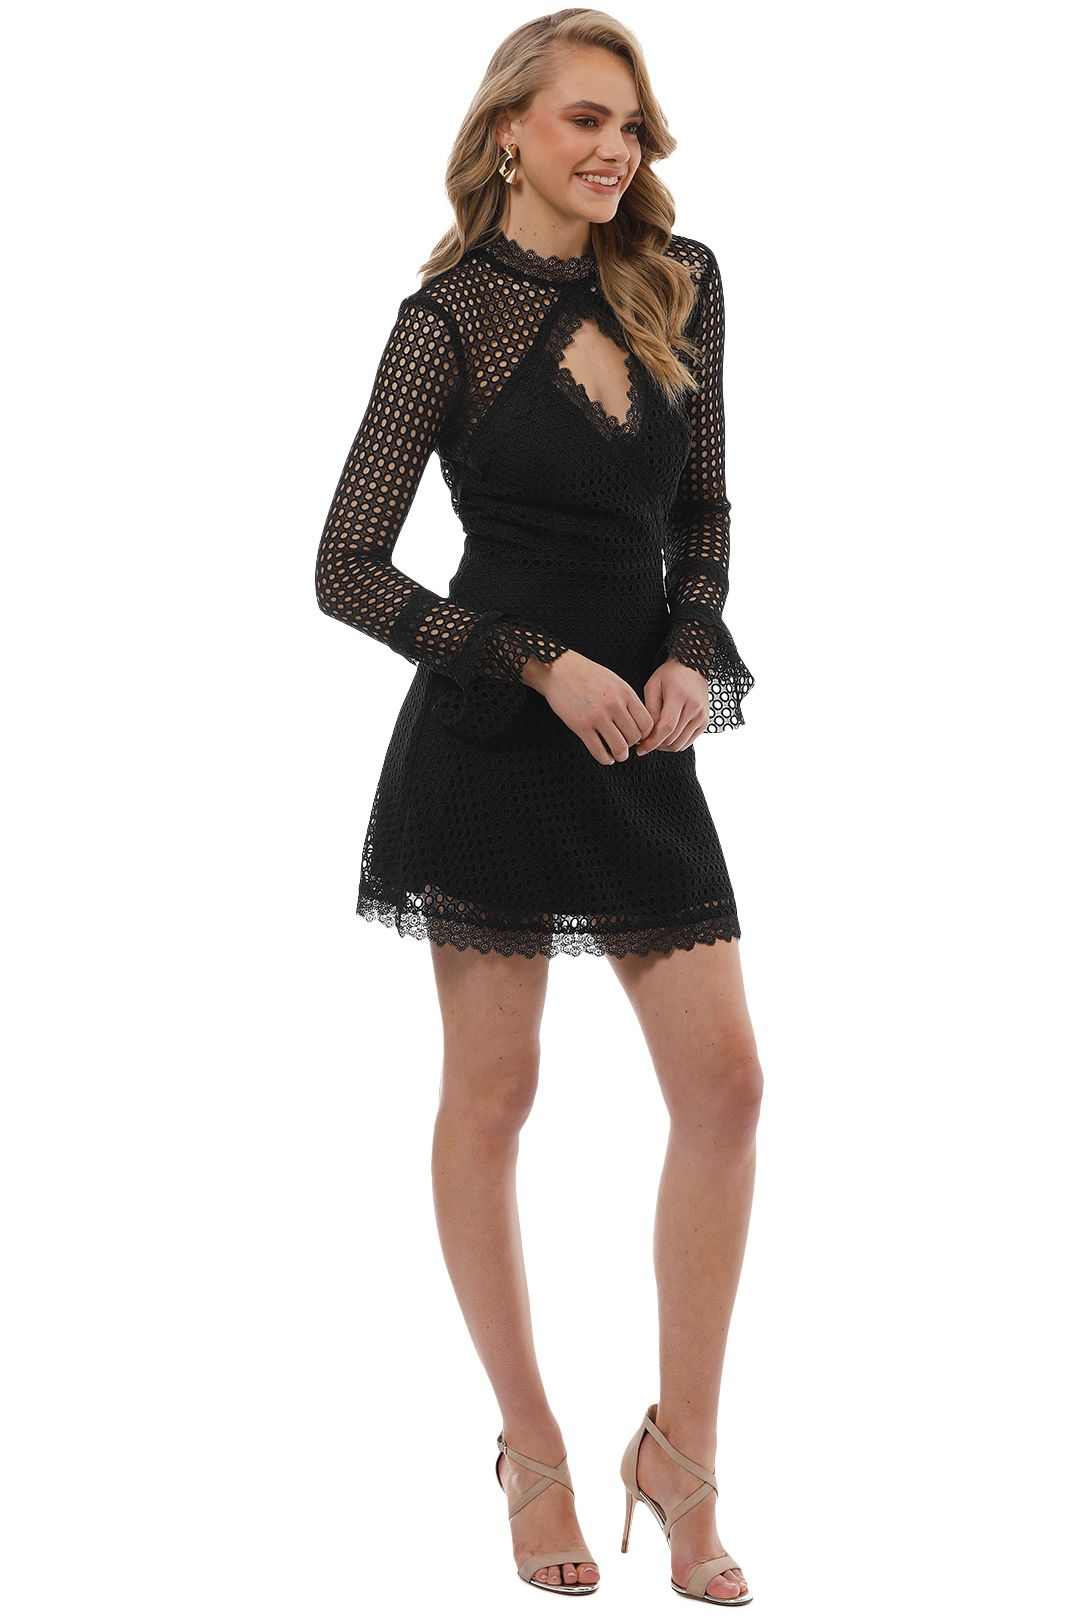 Pasduchas - Reign Dress - Black - Side